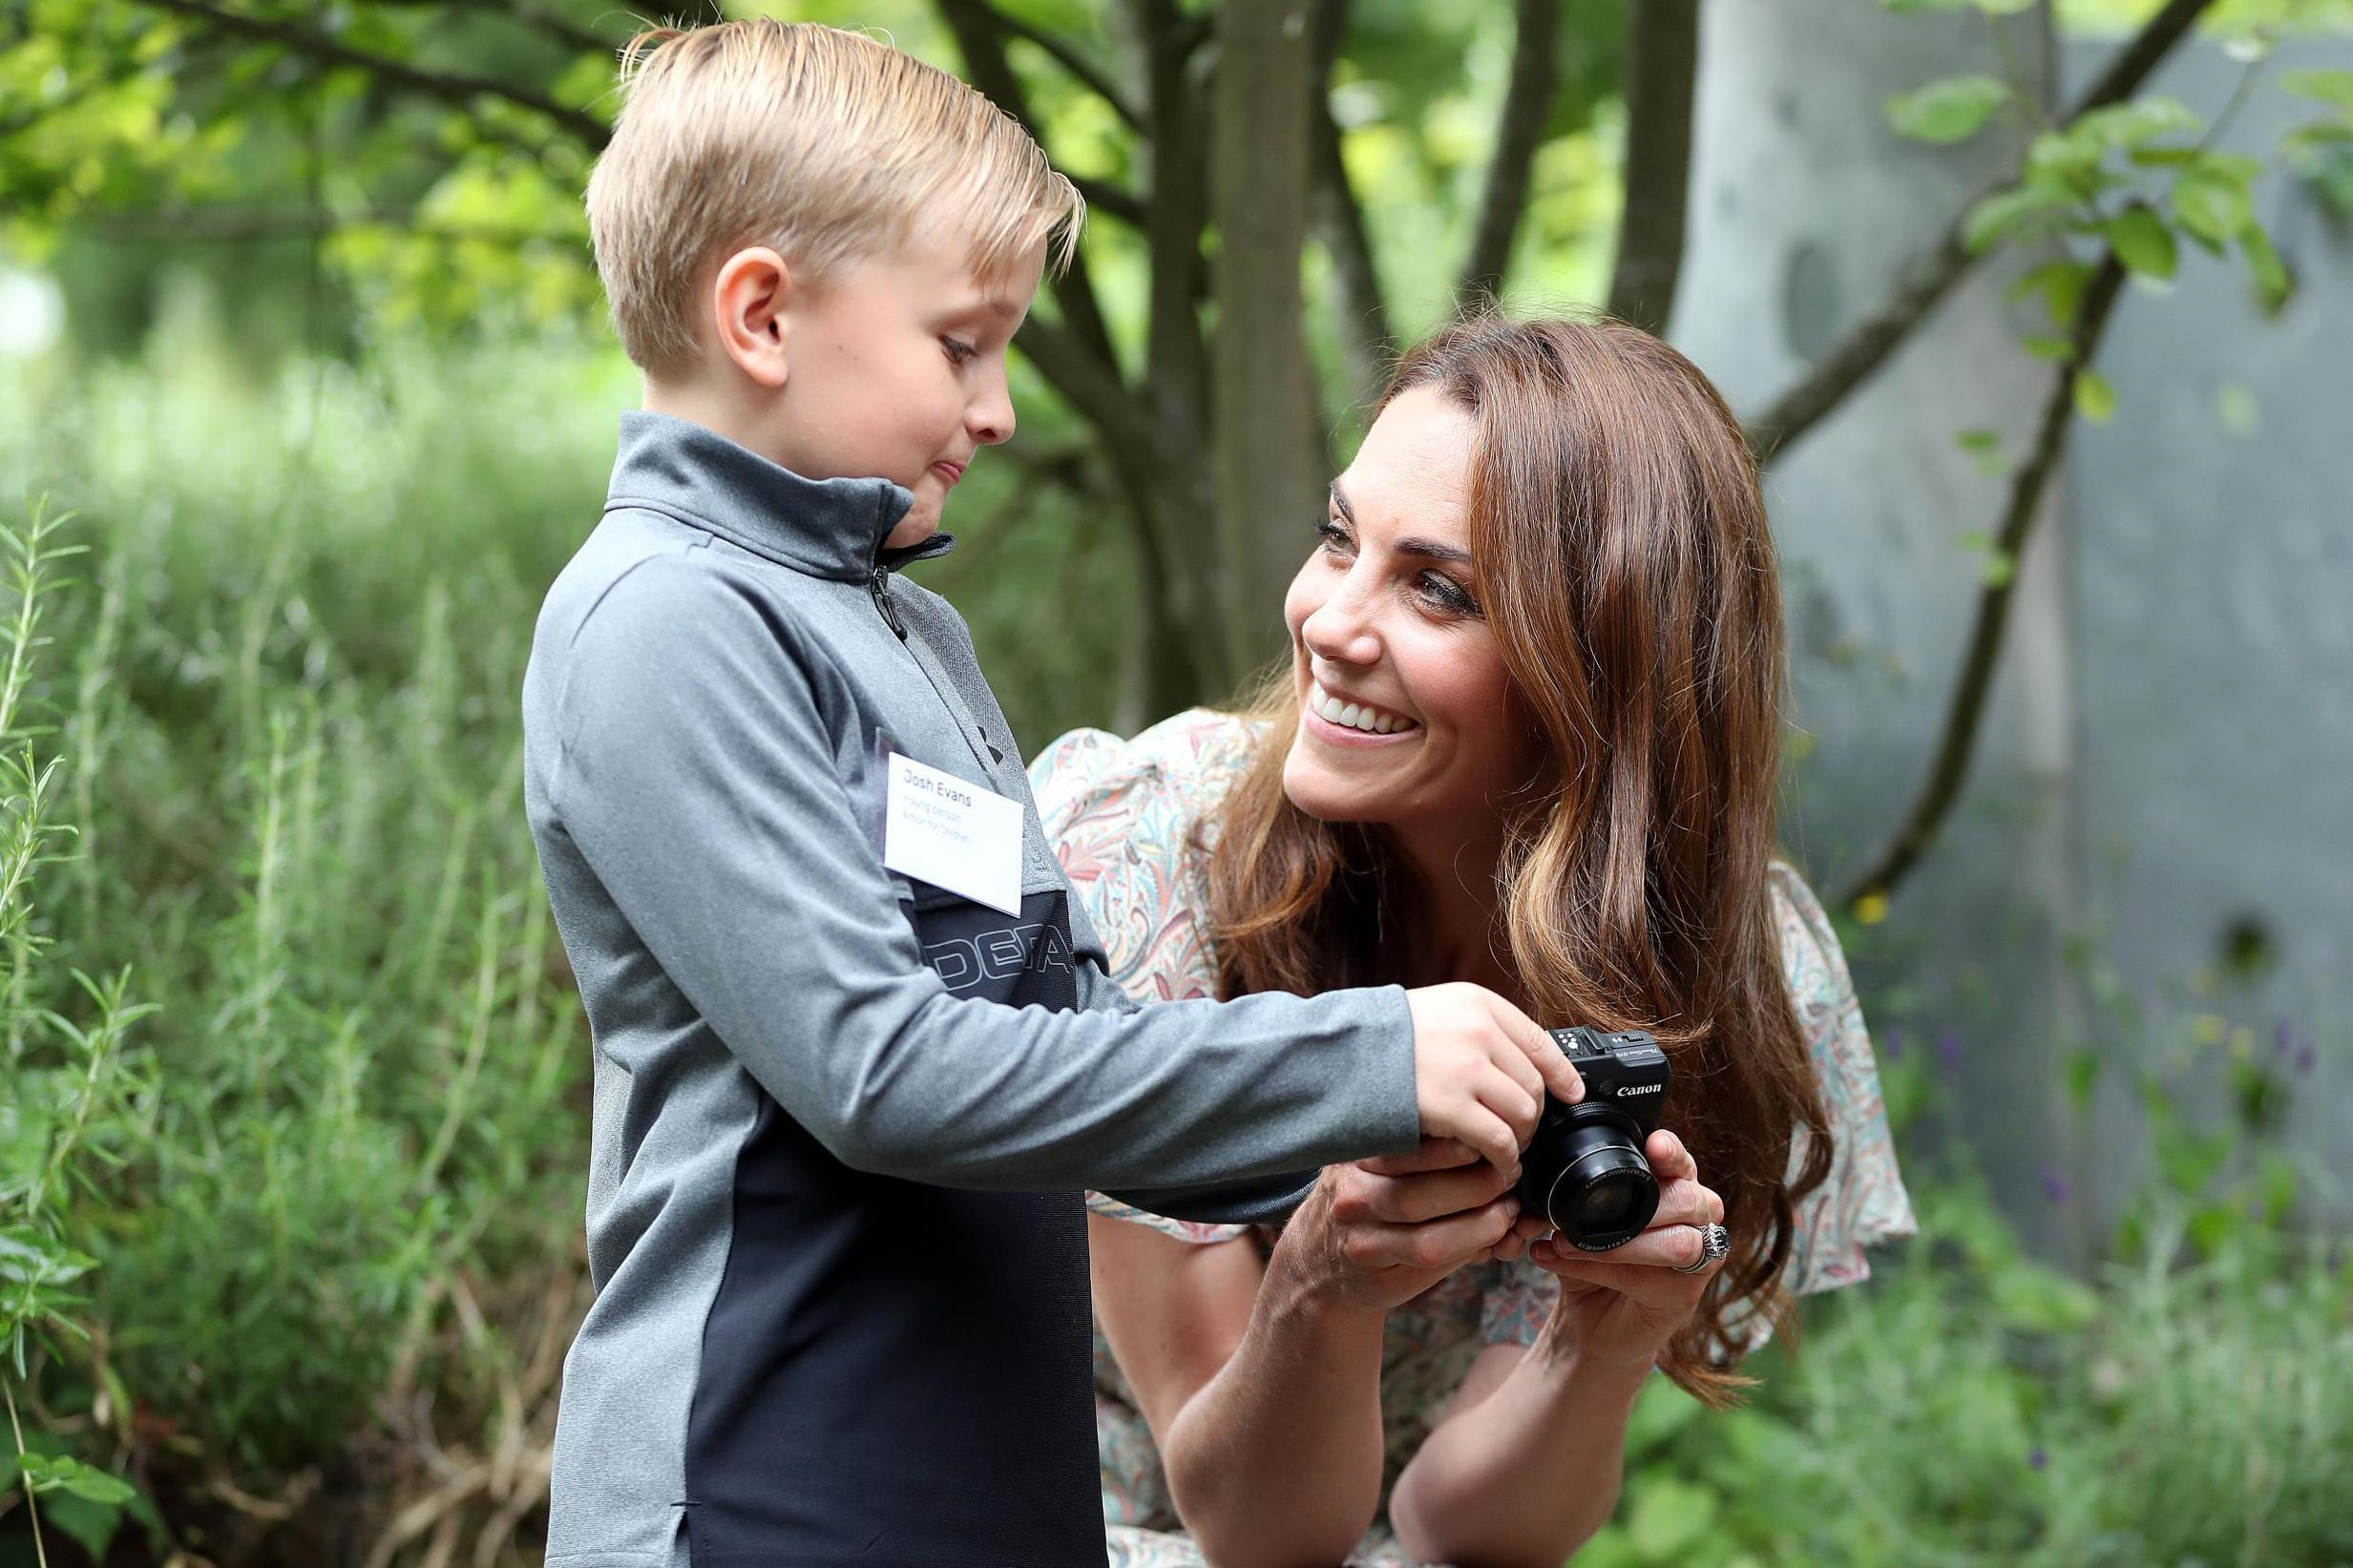 Dia juga telah lama memiliki minat dalam fotografi, bahkan beberapa kali merilis foto anak-anaknya yang merupakan hasil tangkapan kameranya.